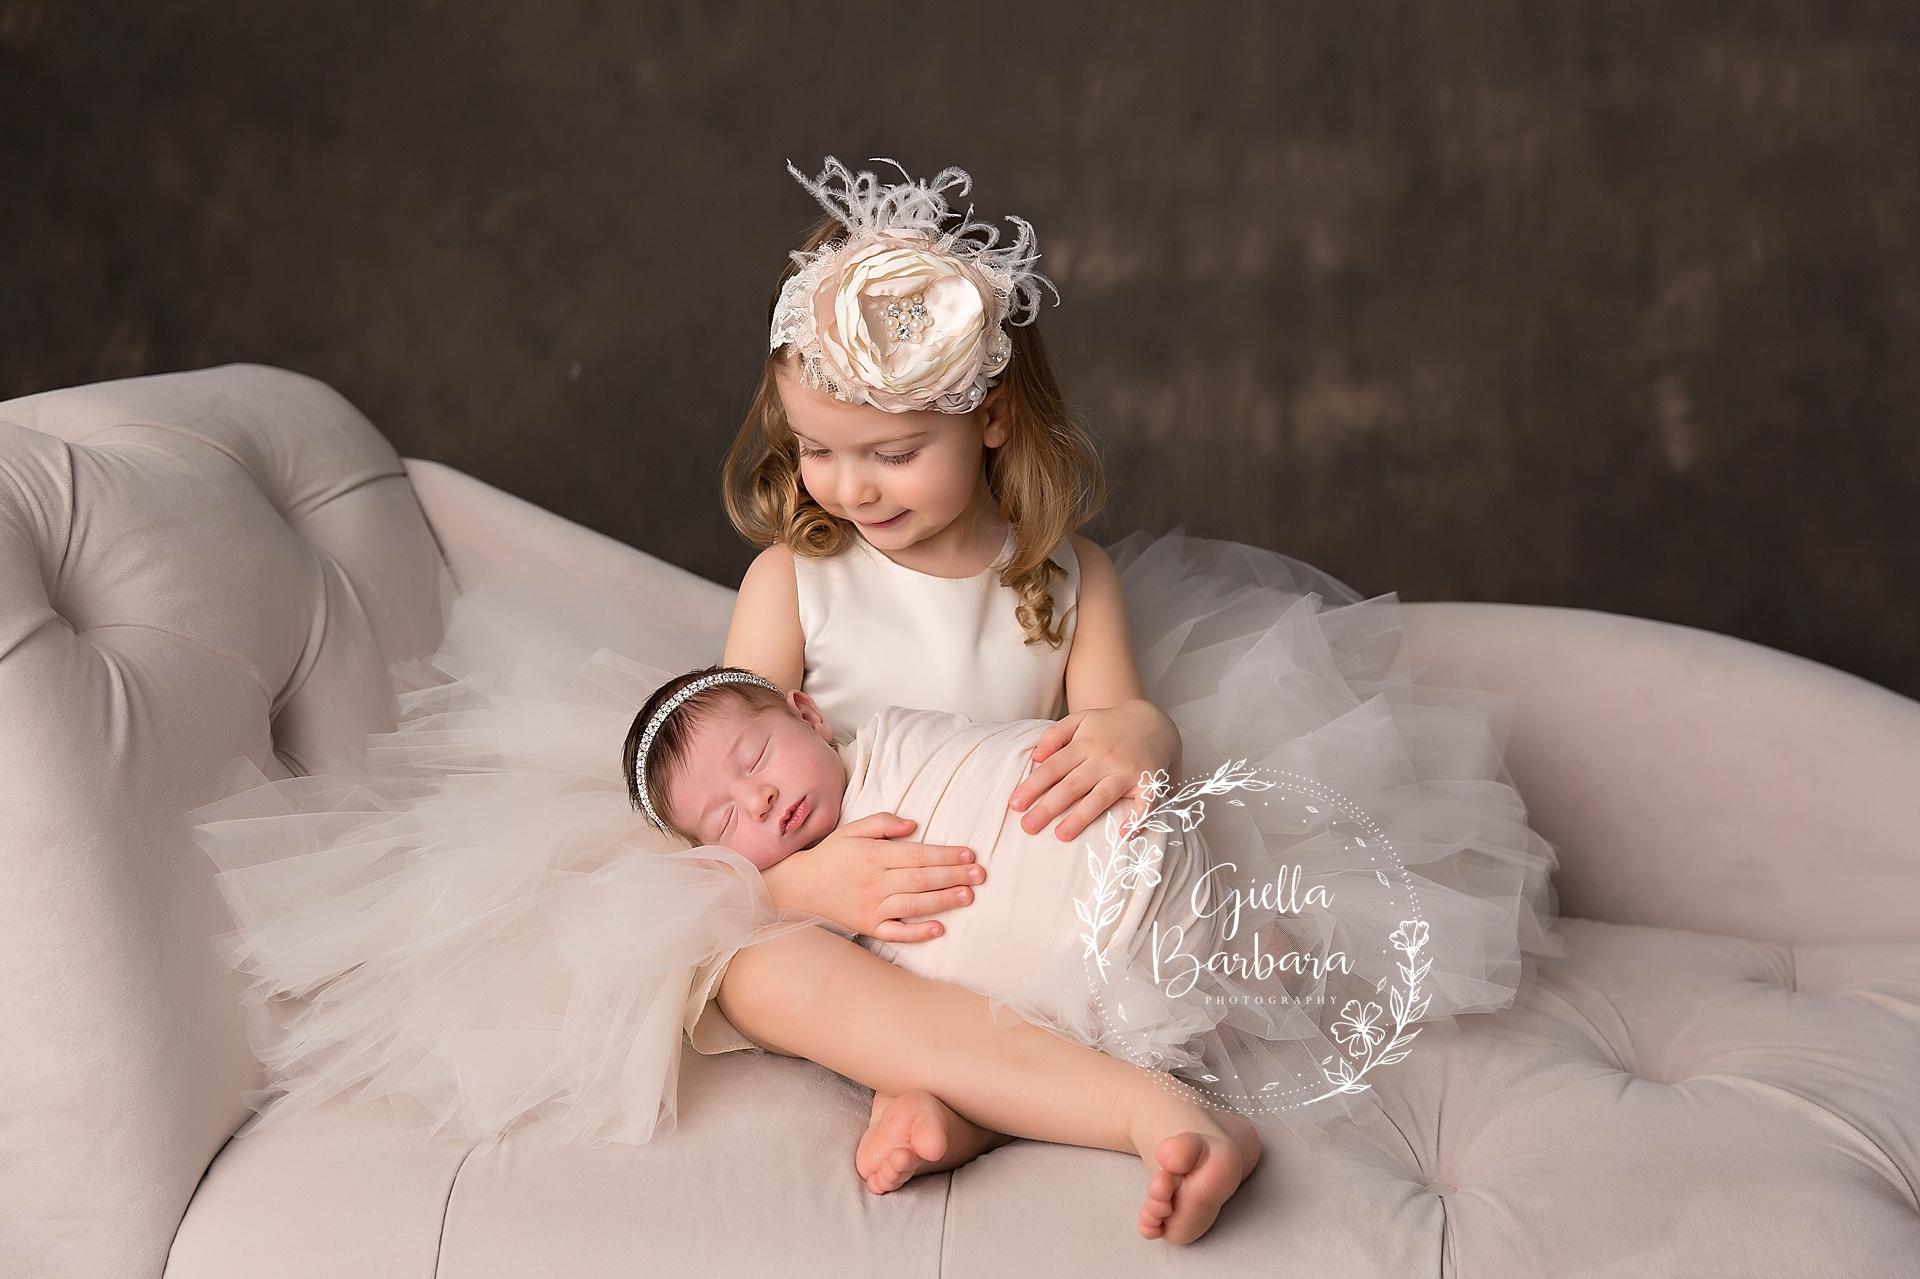 loving on baby sister